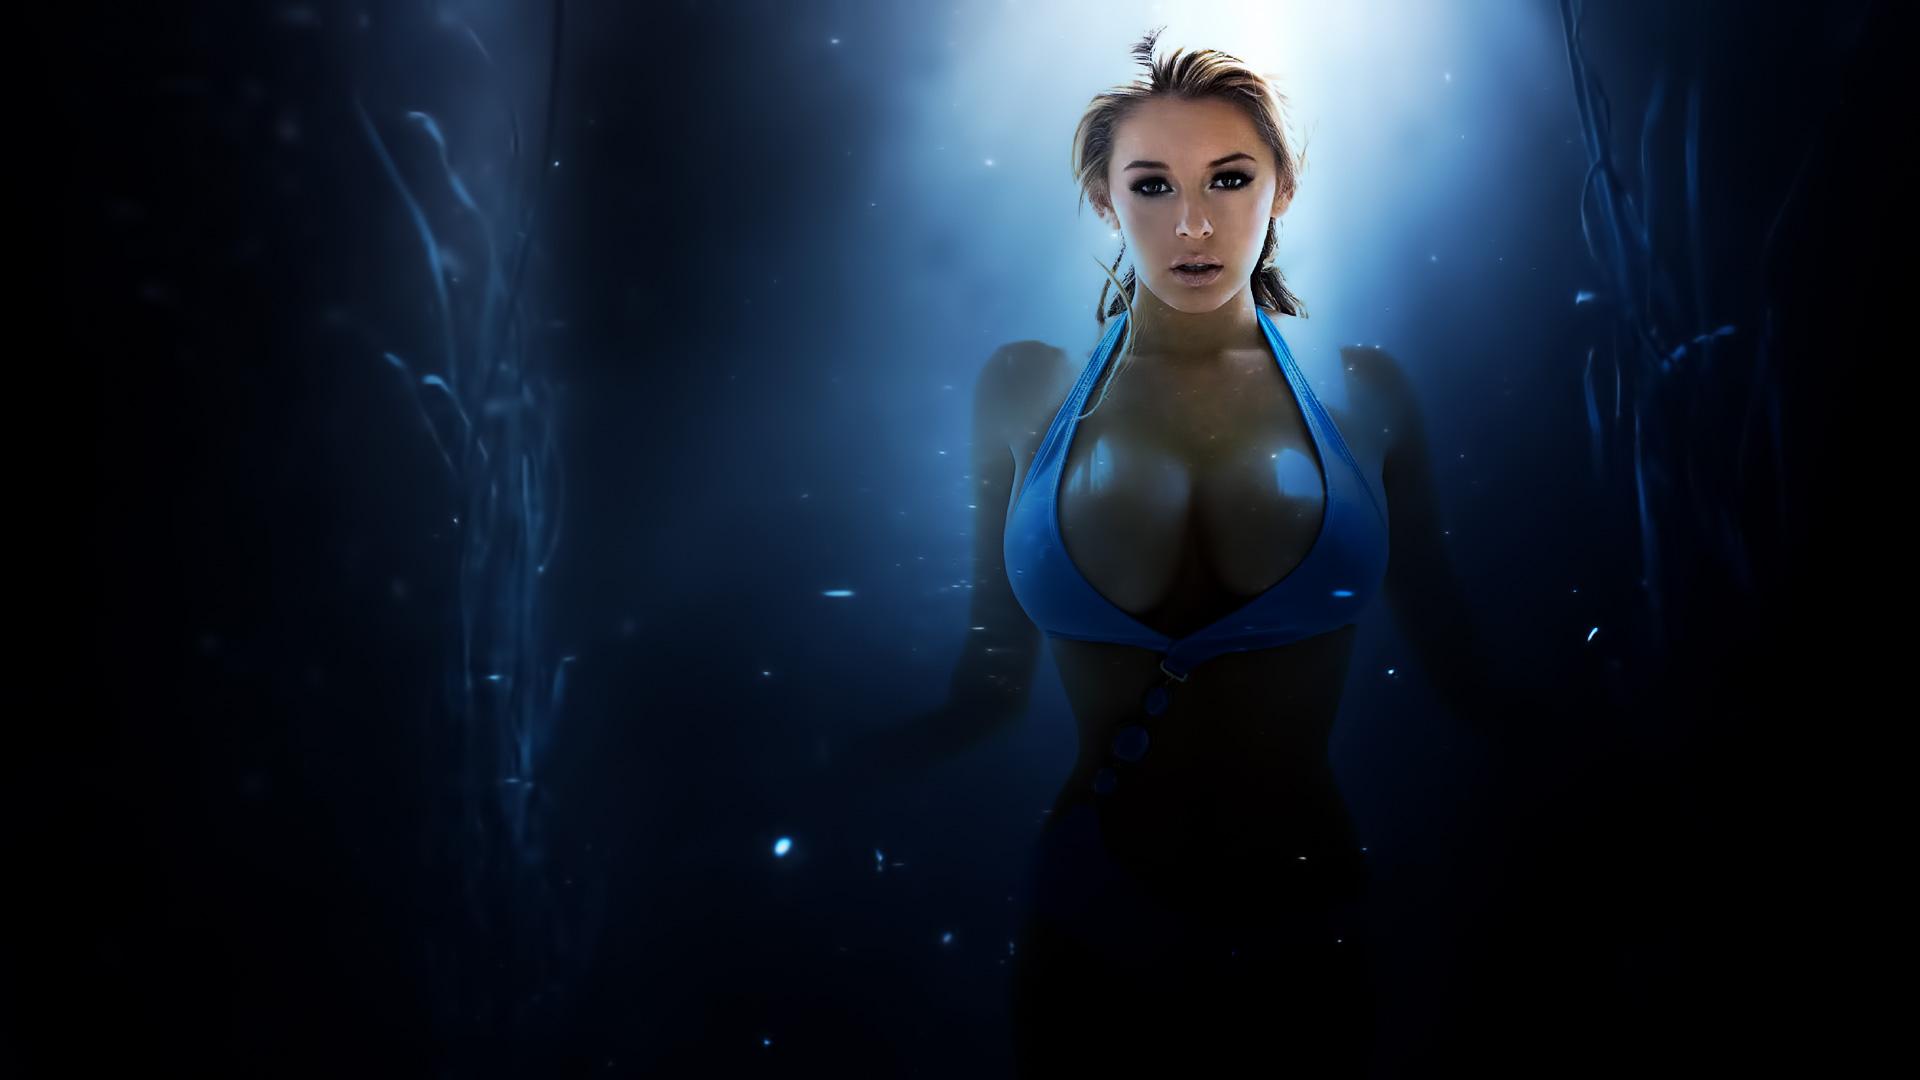 golaya-ekaterina-vilkova-iz-filma